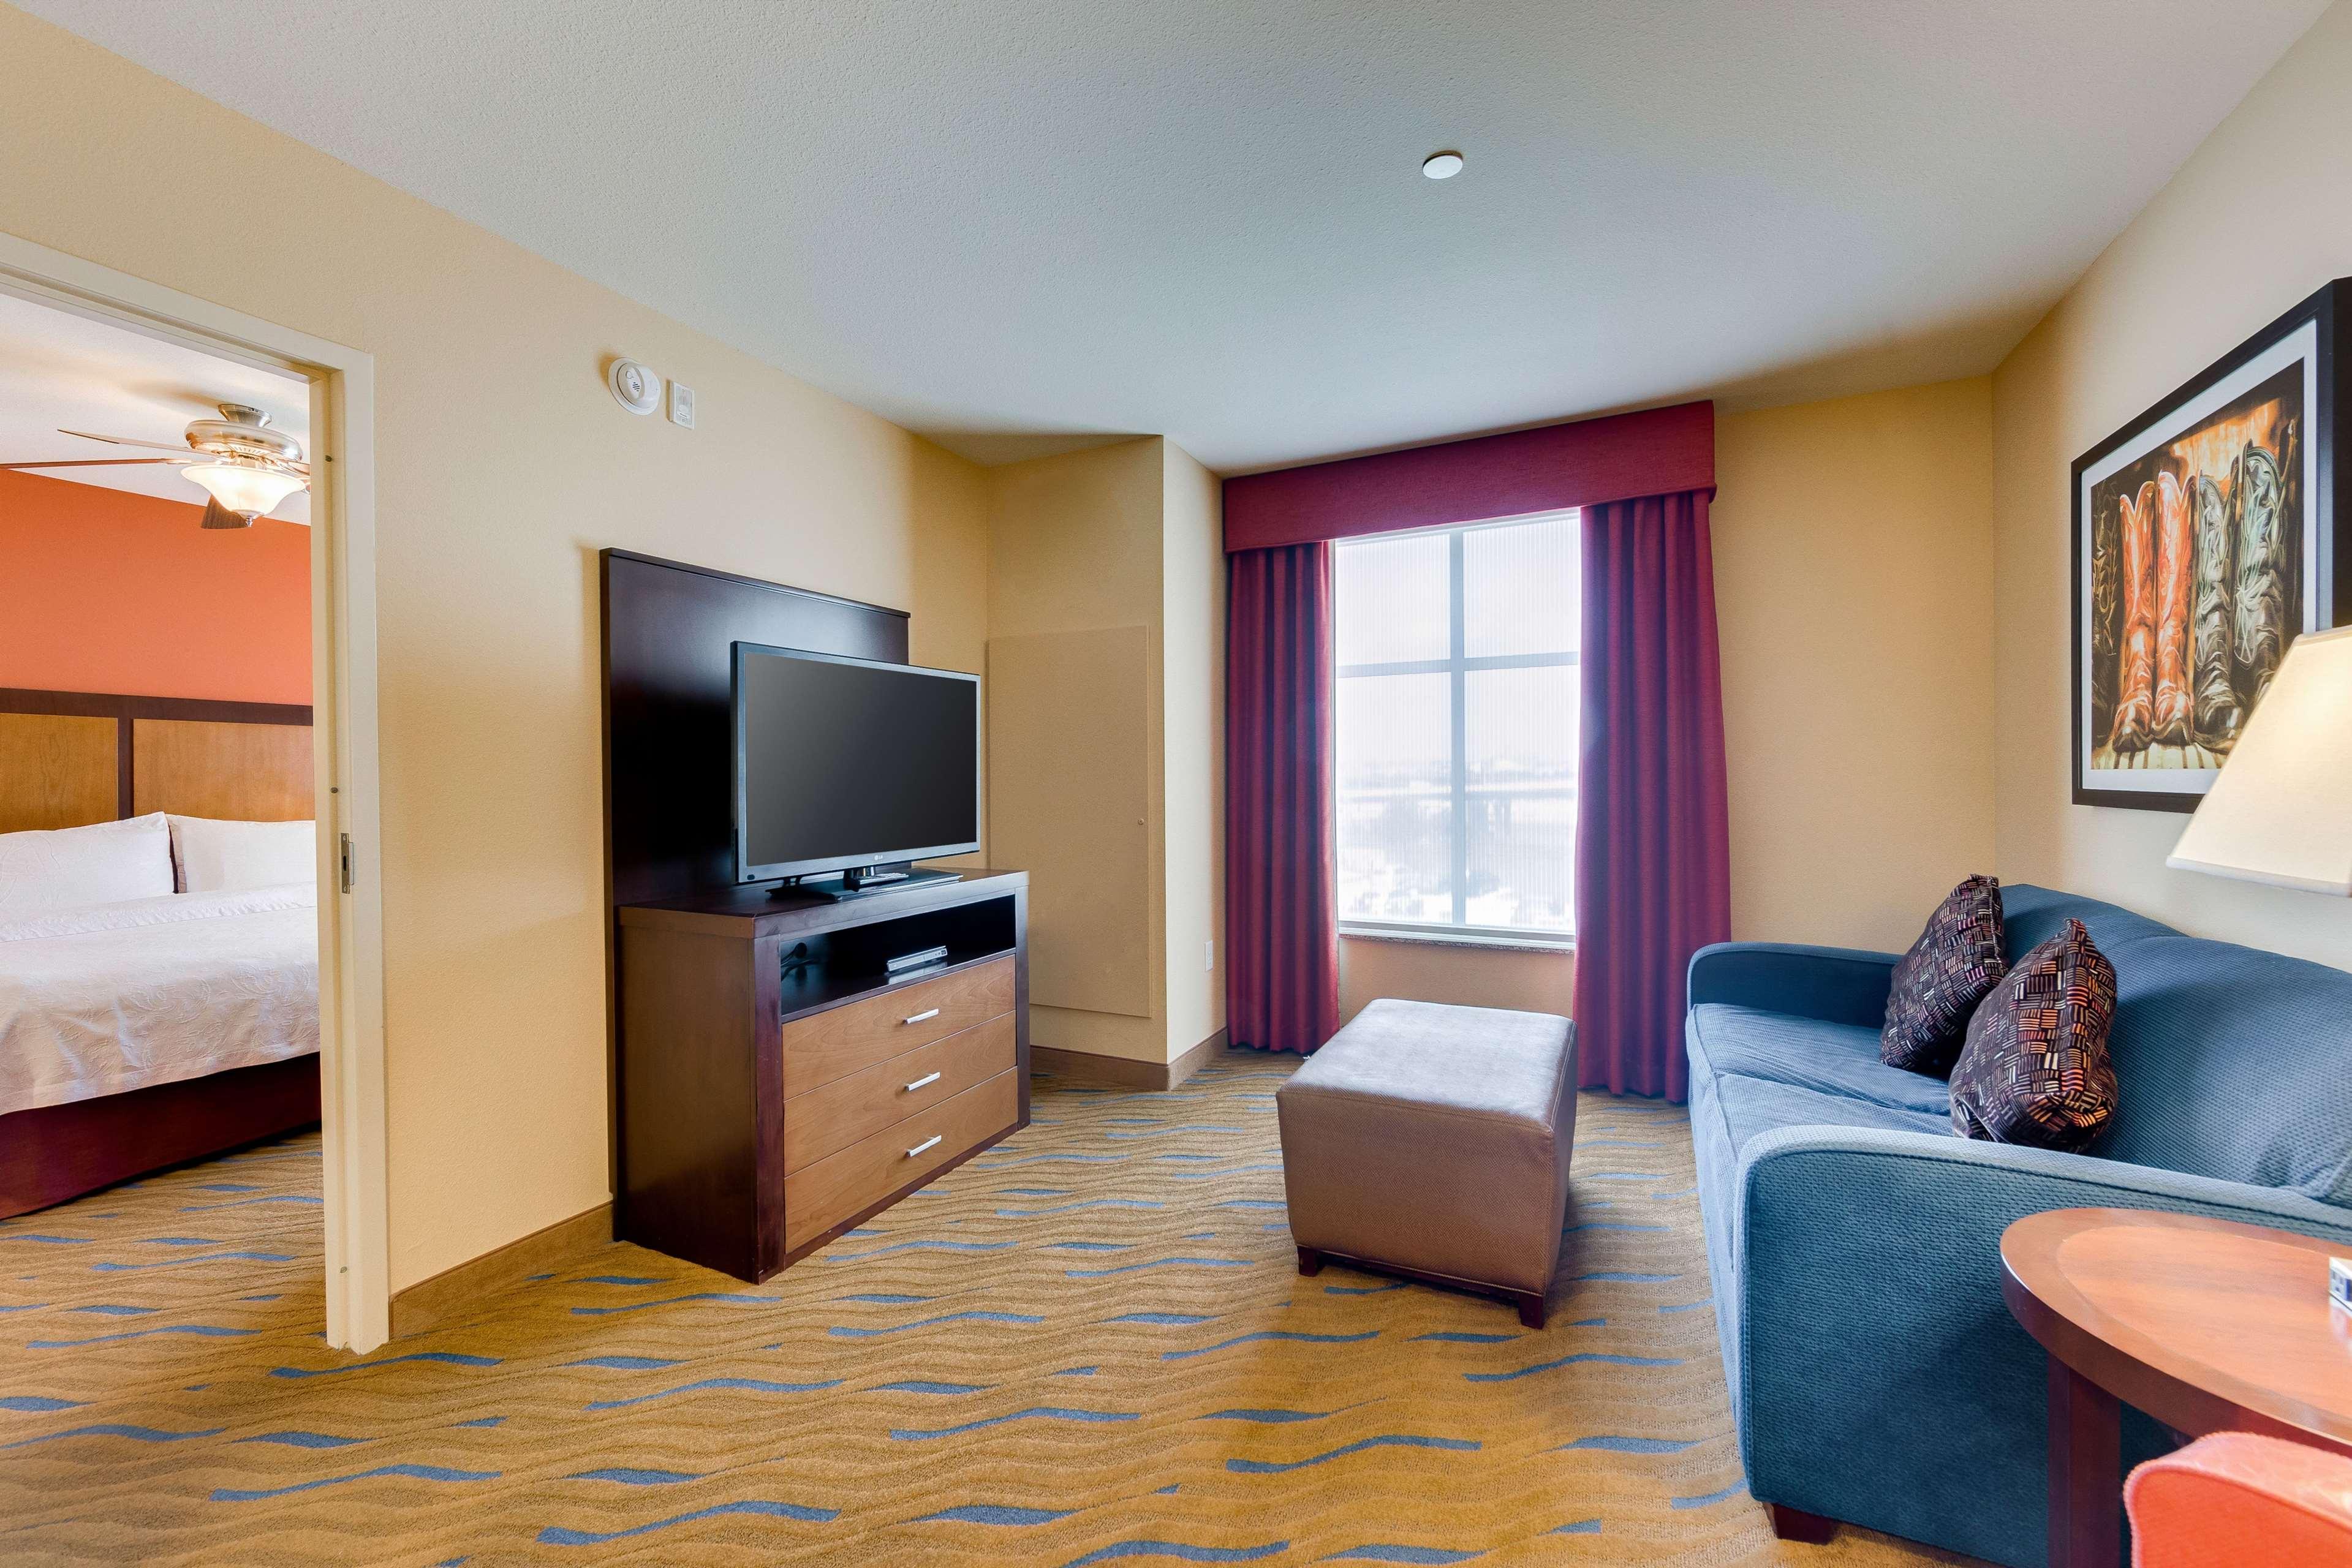 Homewood Suites by Hilton Fort Worth - Medical Center, TX image 19